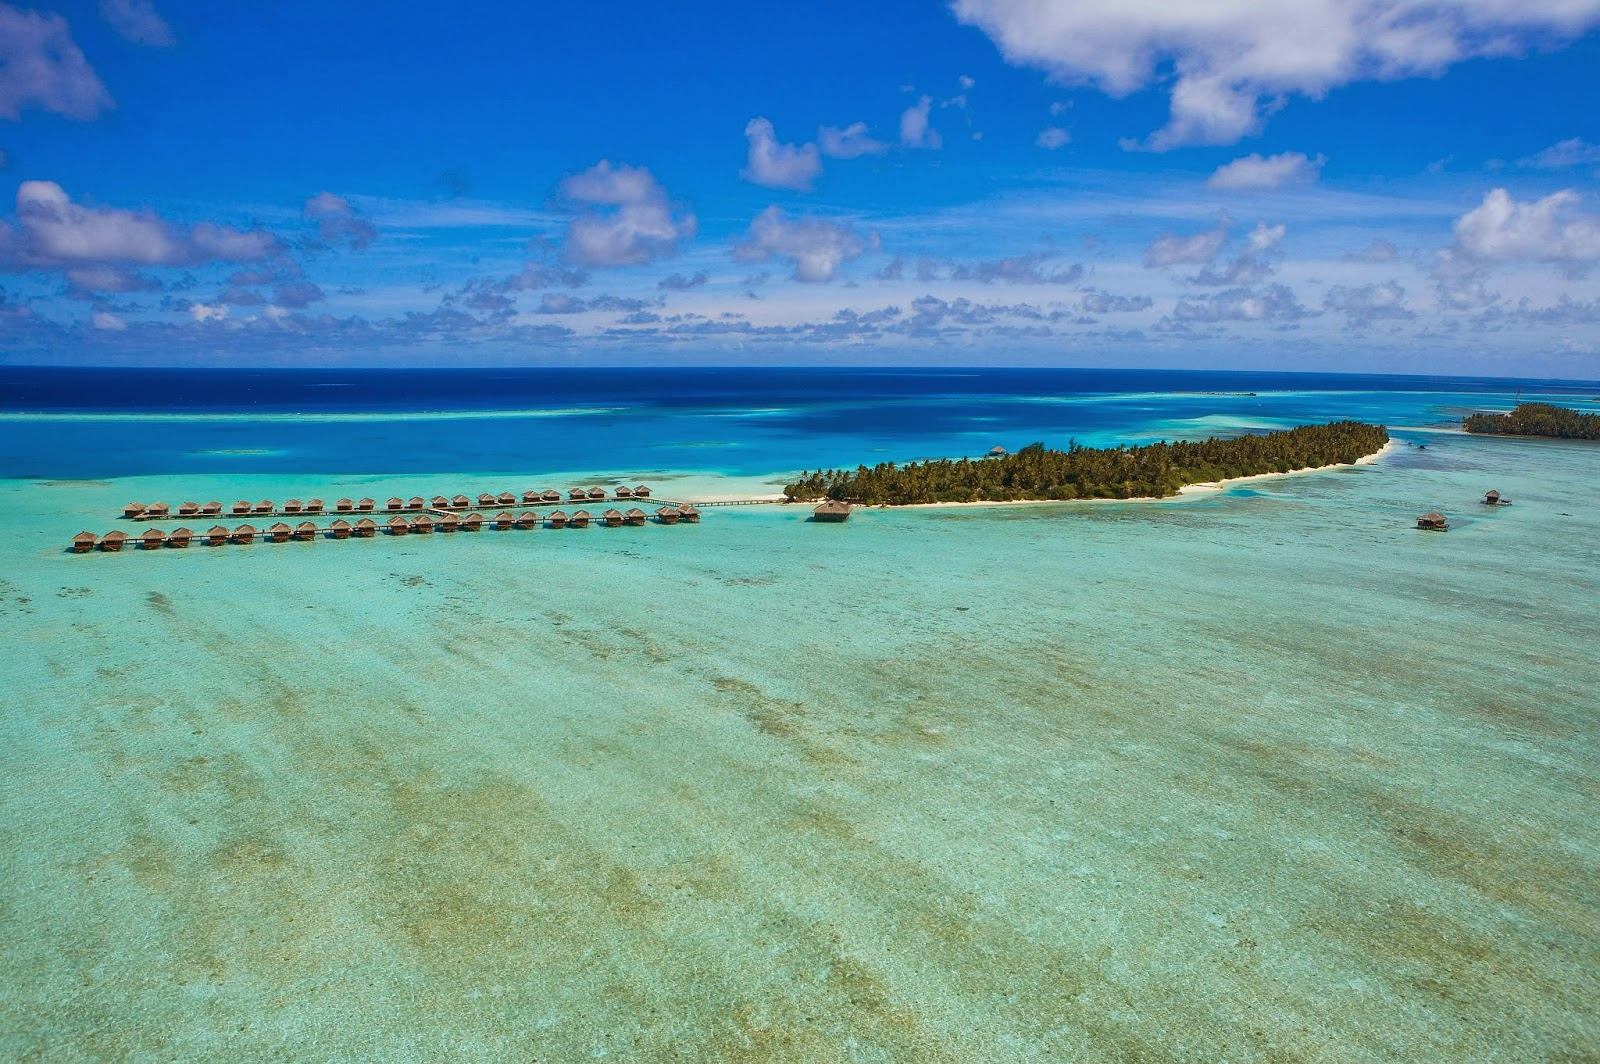 malediven reisen blog medhufushi island resort malediven. Black Bedroom Furniture Sets. Home Design Ideas